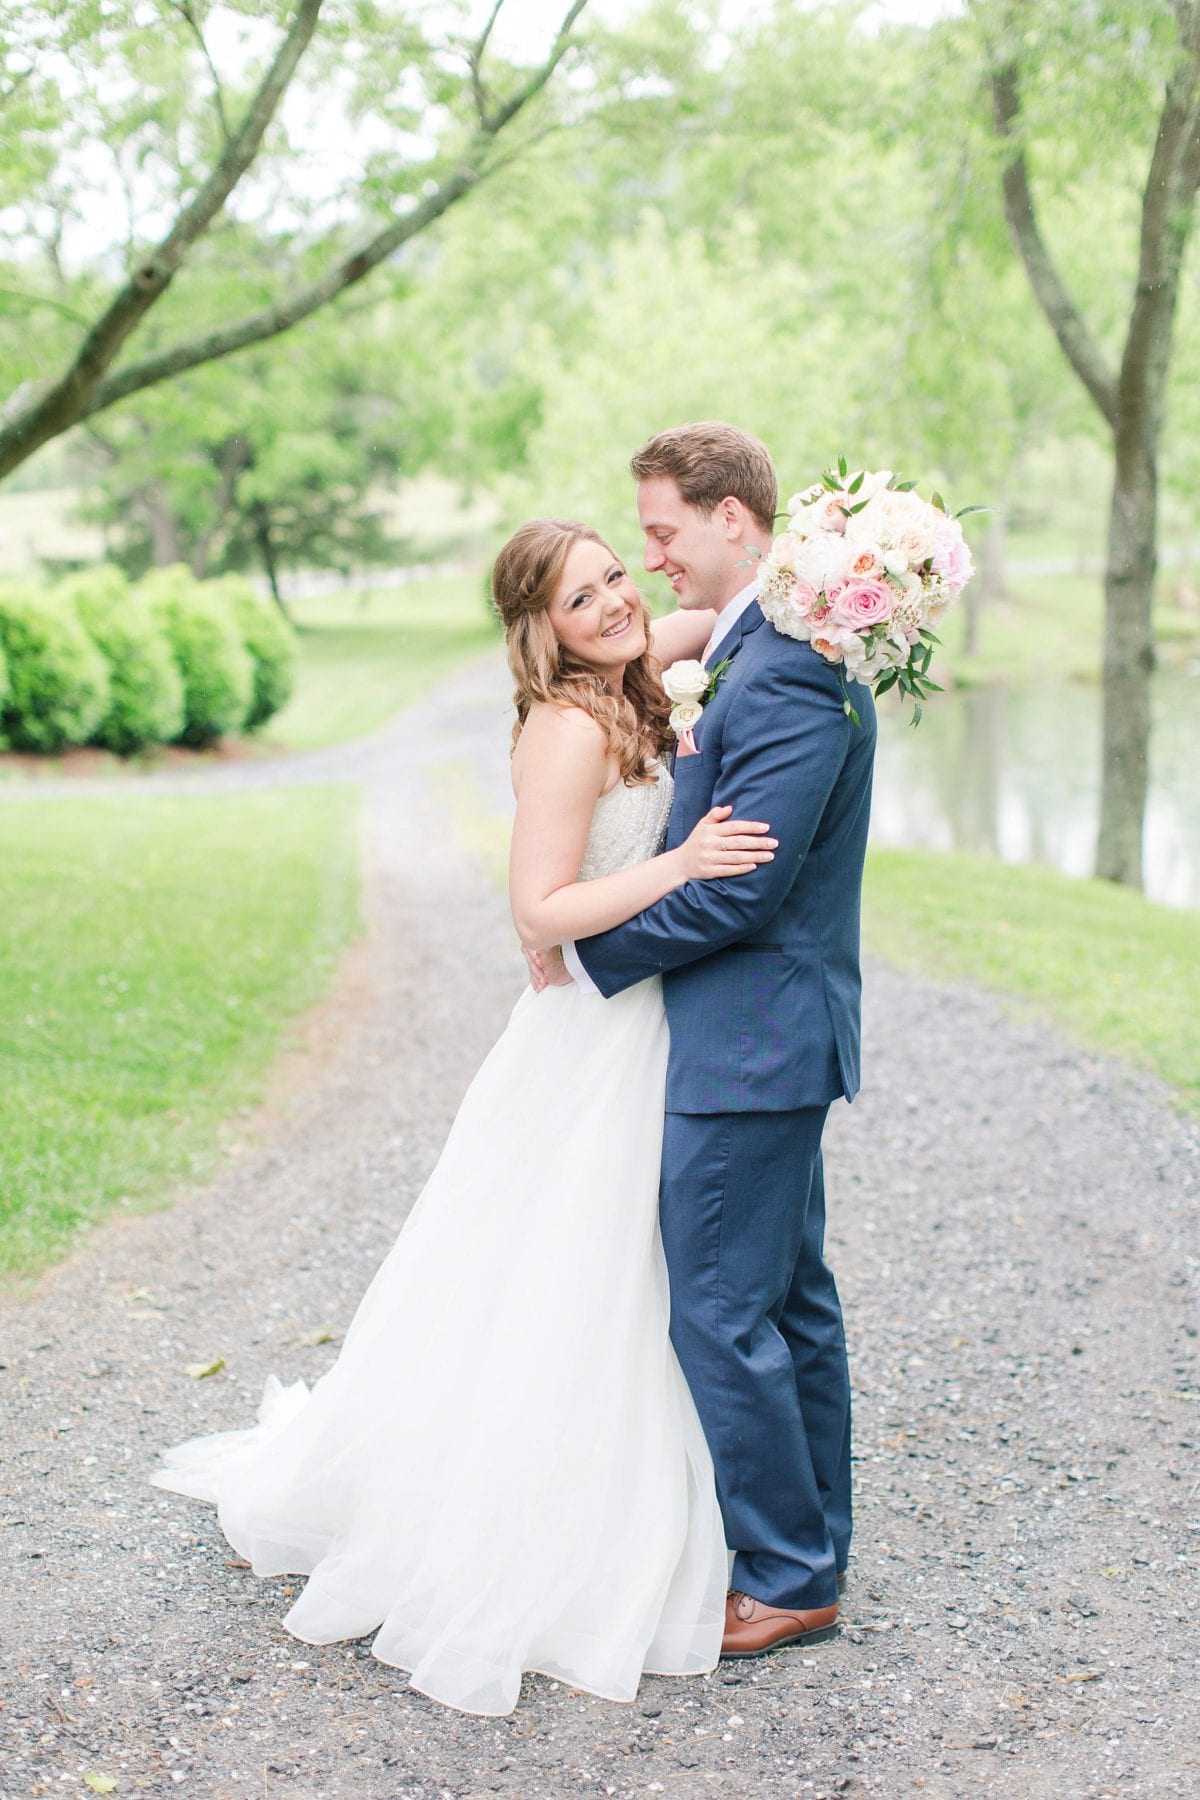 Justin & Megan Big Spring Farm Wedding Photos-123.jpg